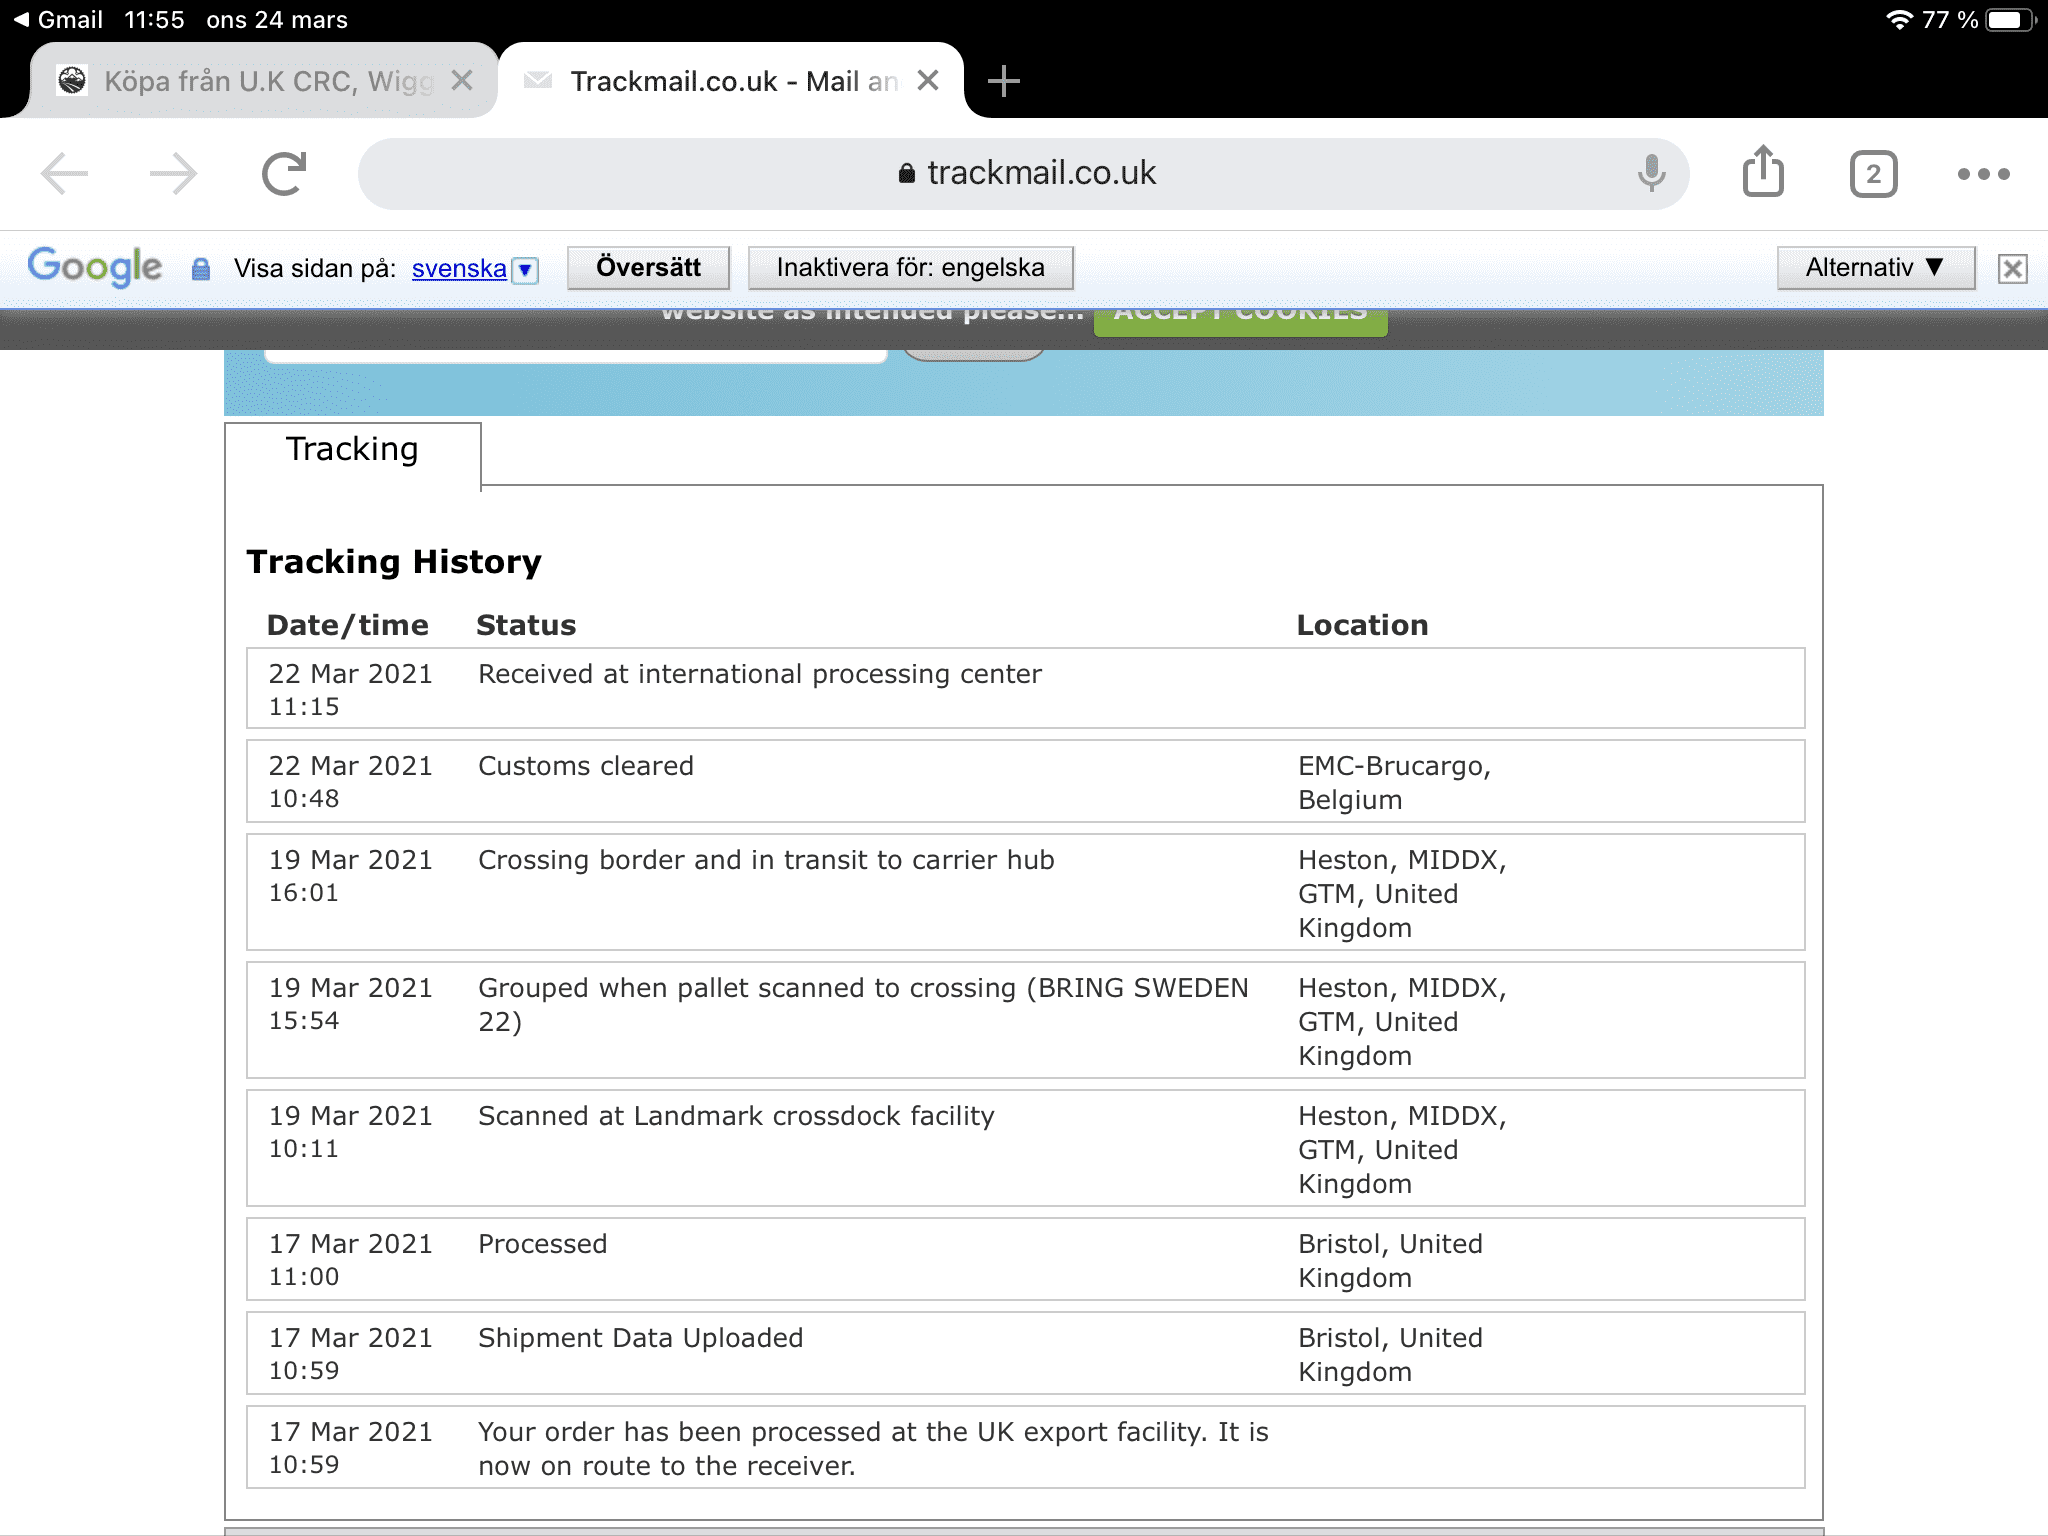 D8B546D6-6775-43C4-BF4D-3E680418CB01.png